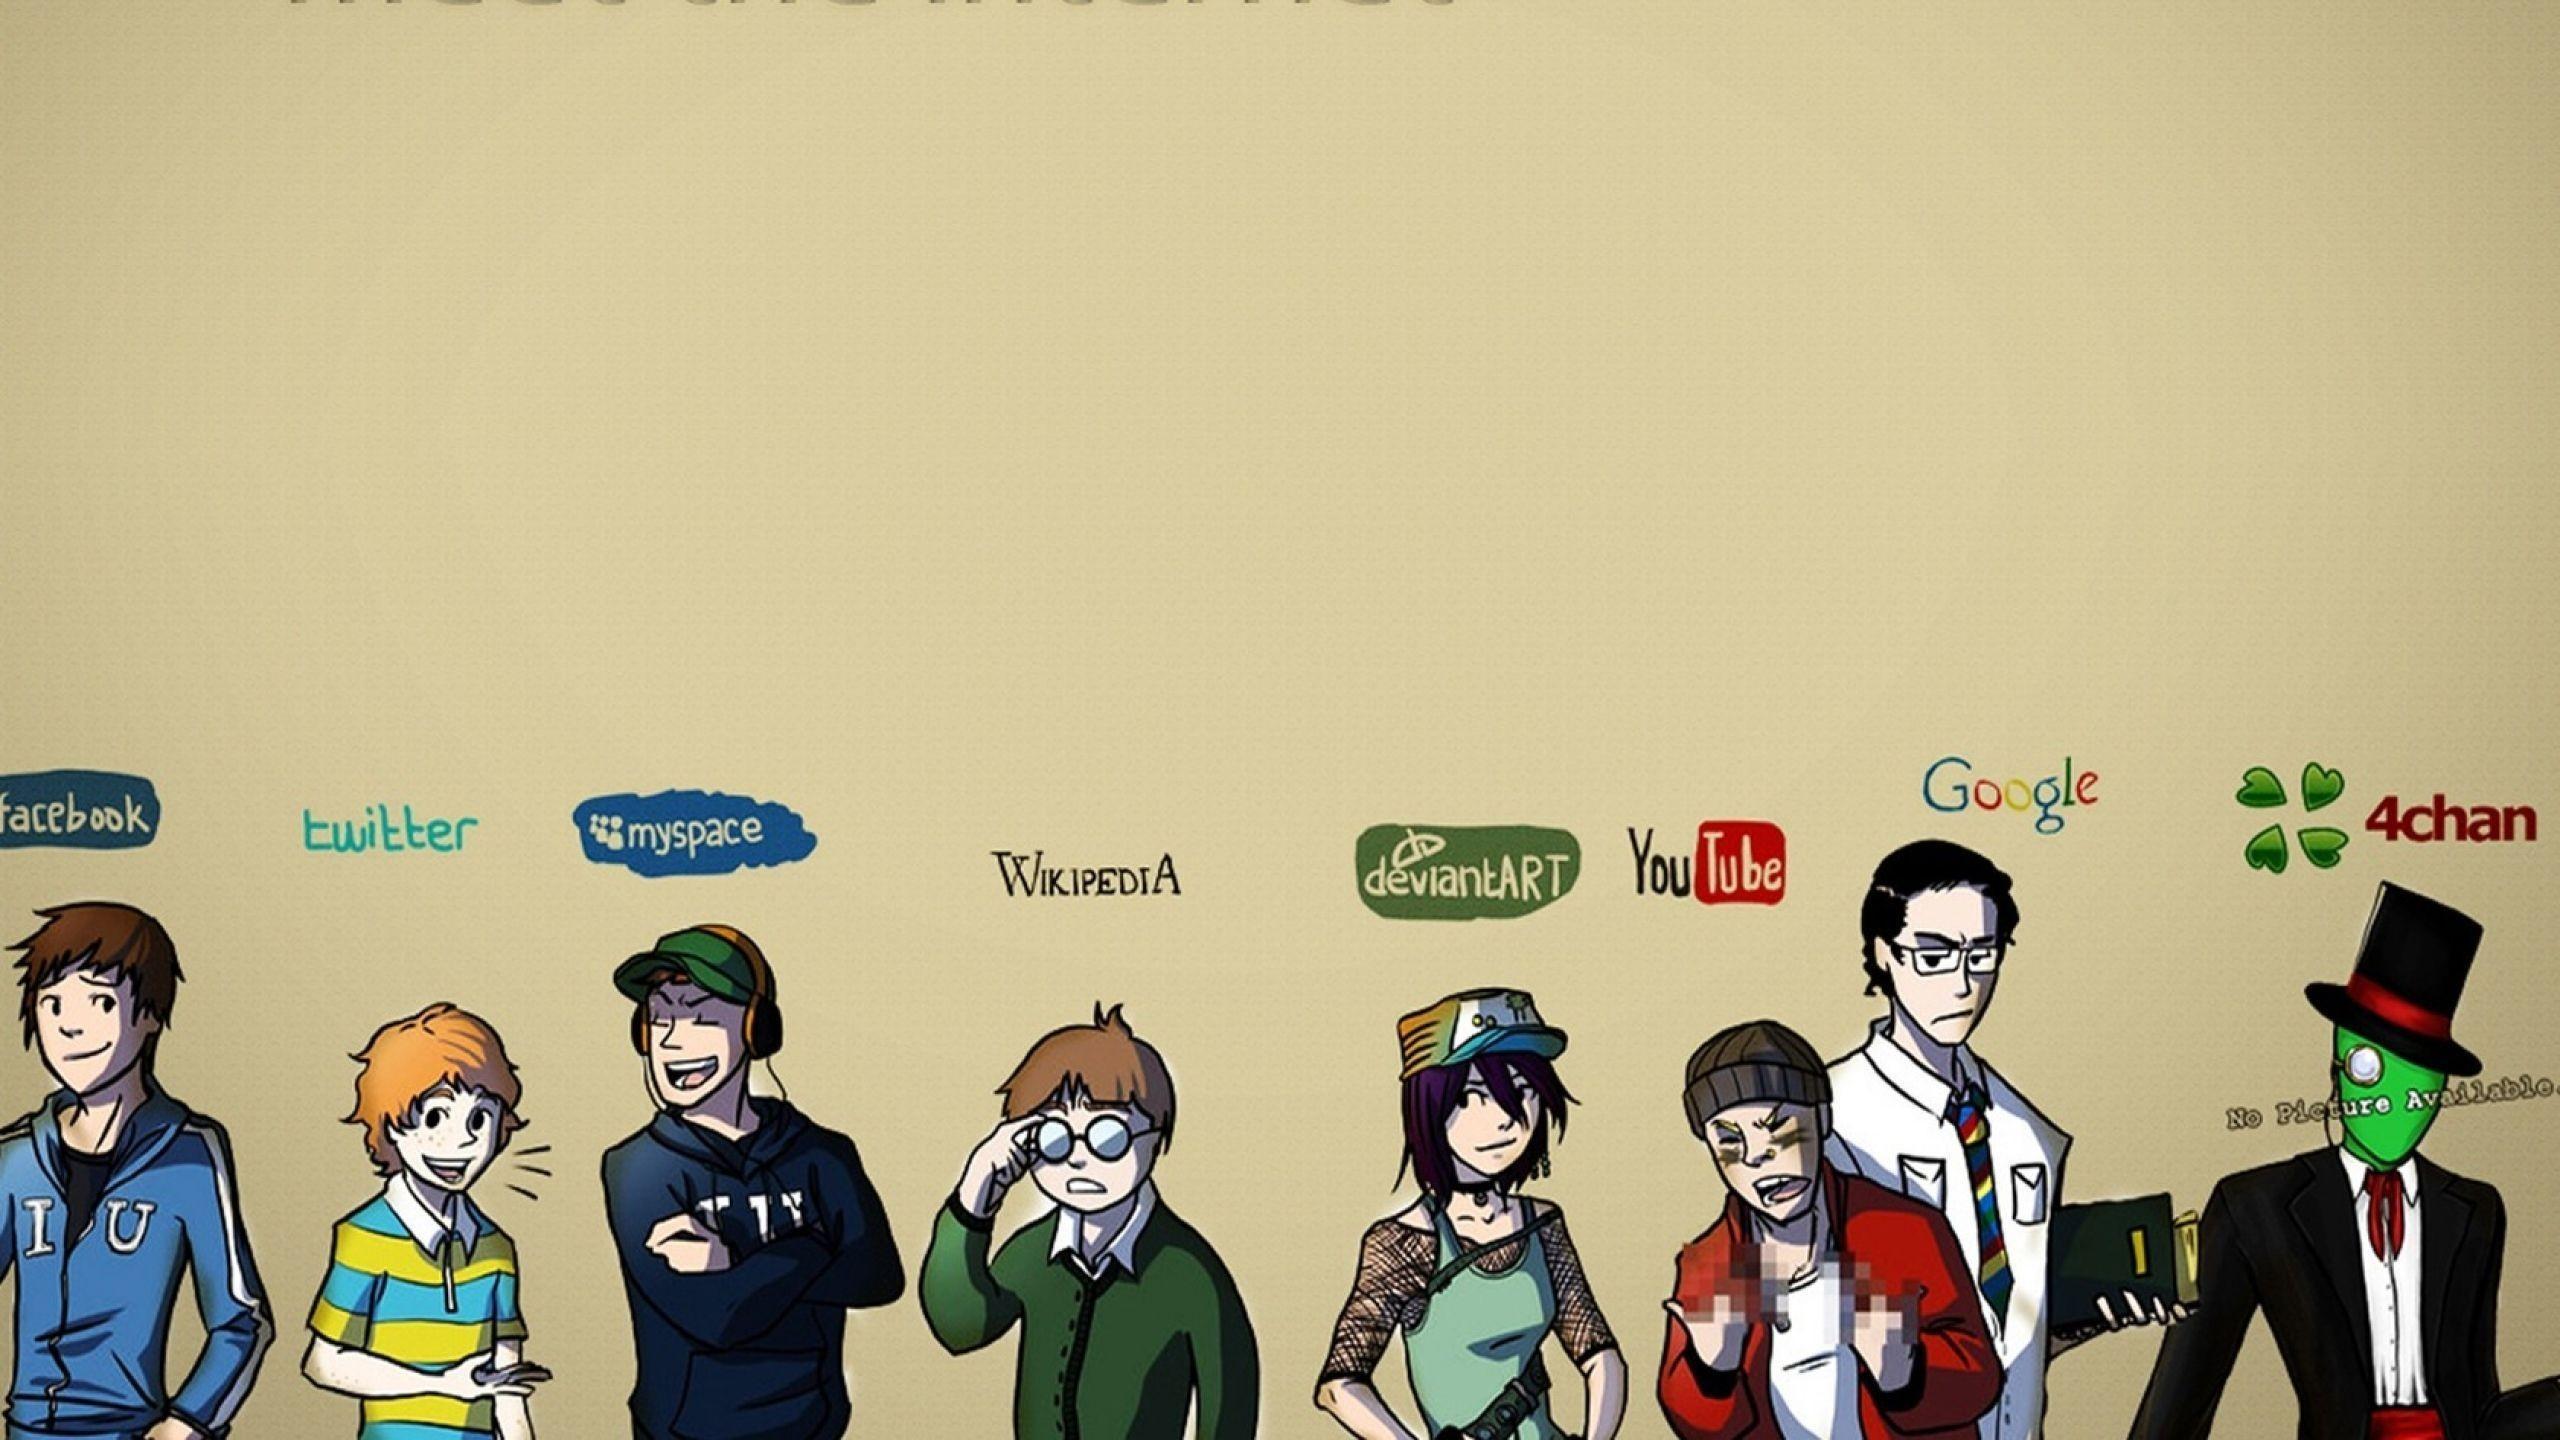 Download Wallpaper Internet, Facebook, Twitter, Myspace .